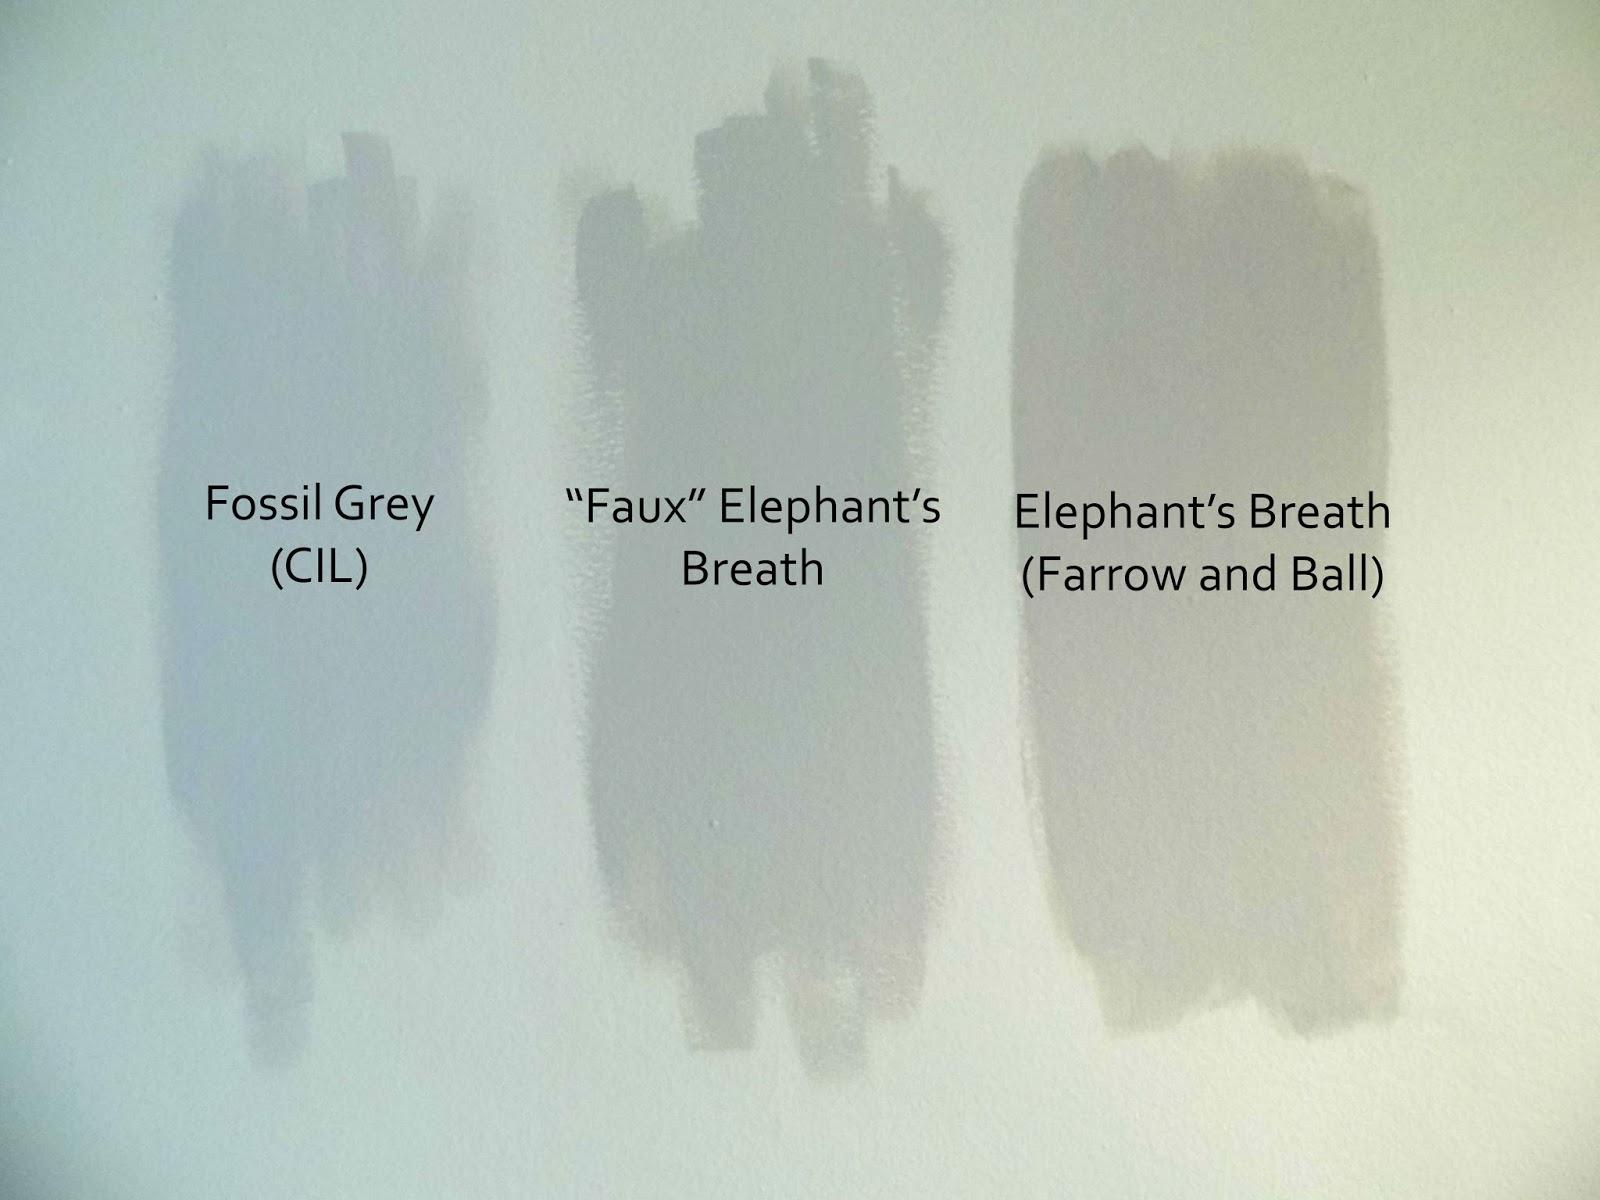 Geliefde Fresh Coat of Paint: The Farrow and Ball Test @XN84